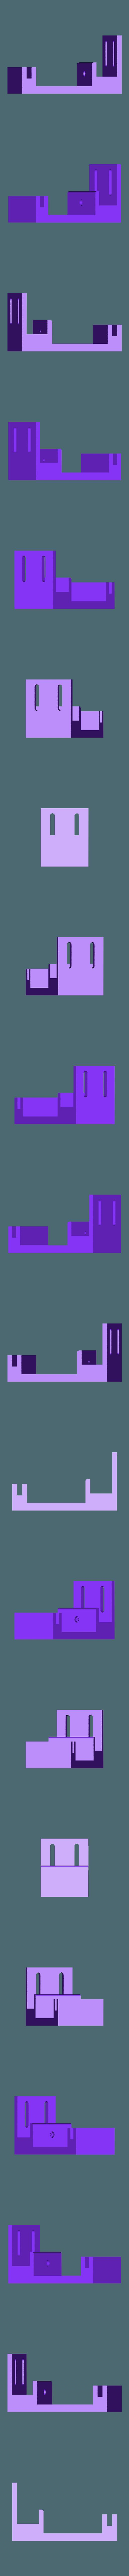 adapteur_raspberry.STL Download free STL file raspberry support • 3D print object, yearzero